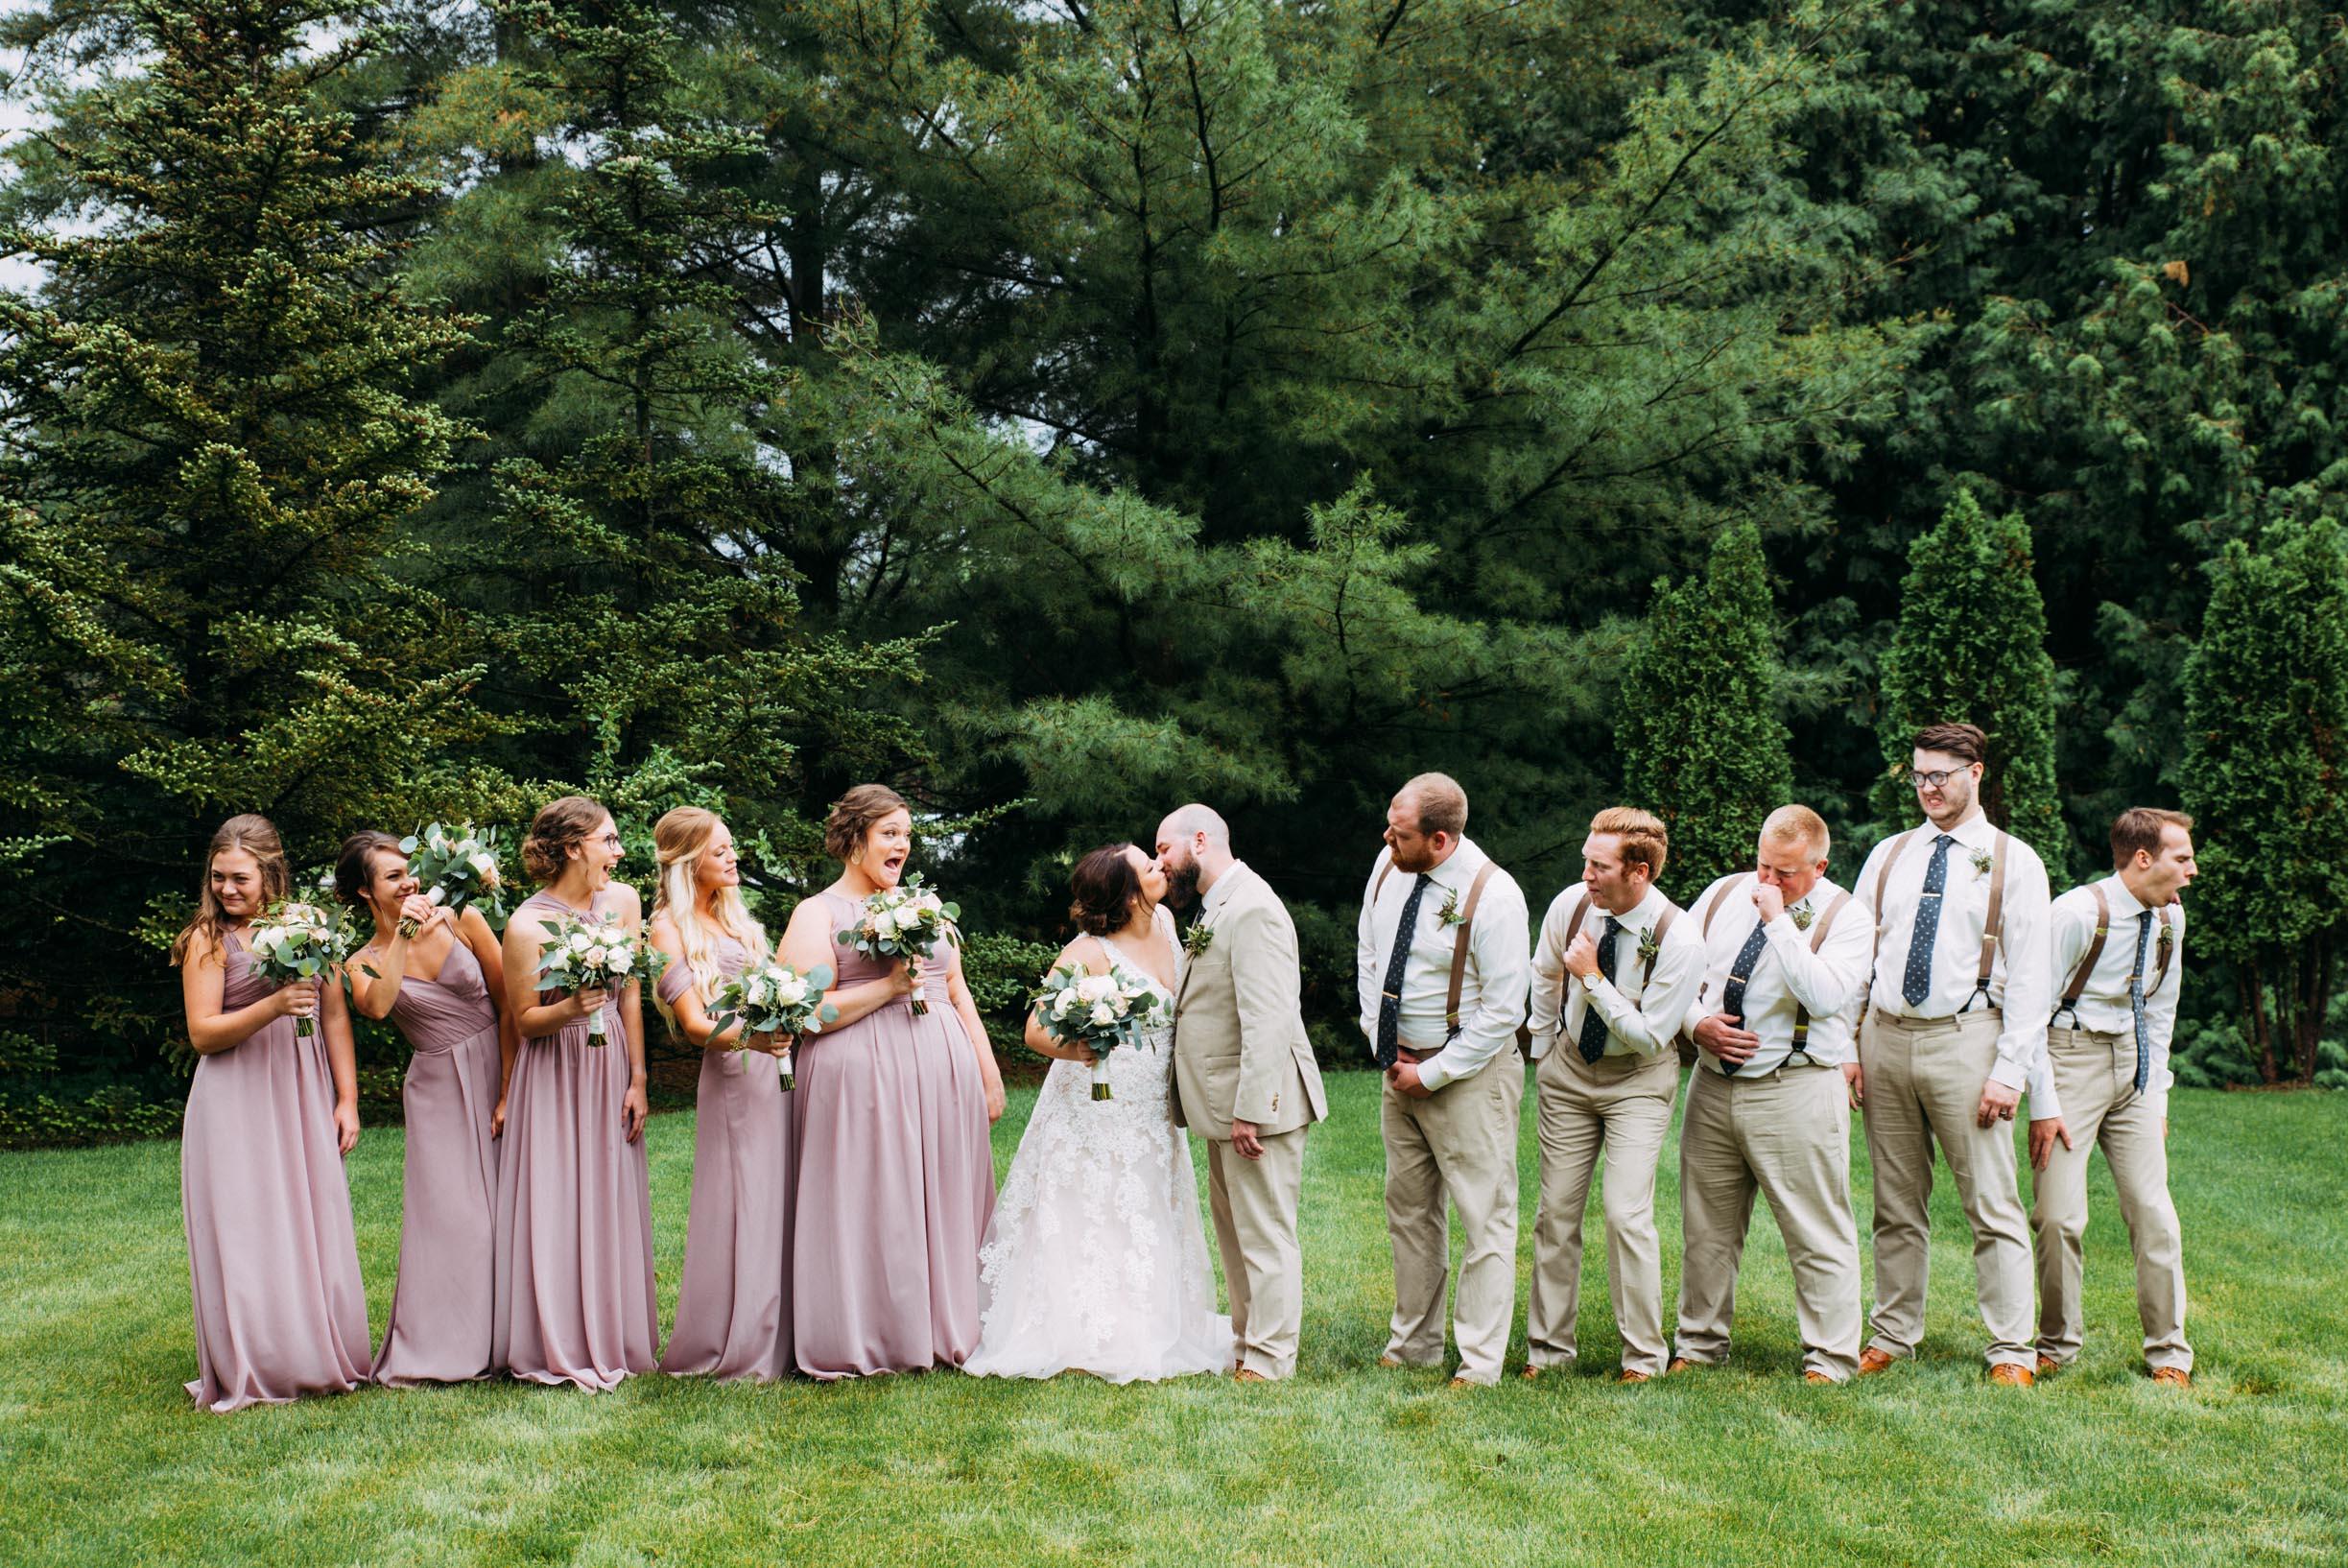 14-Jess_Jeremy_Minnesota_Wedding.jpg